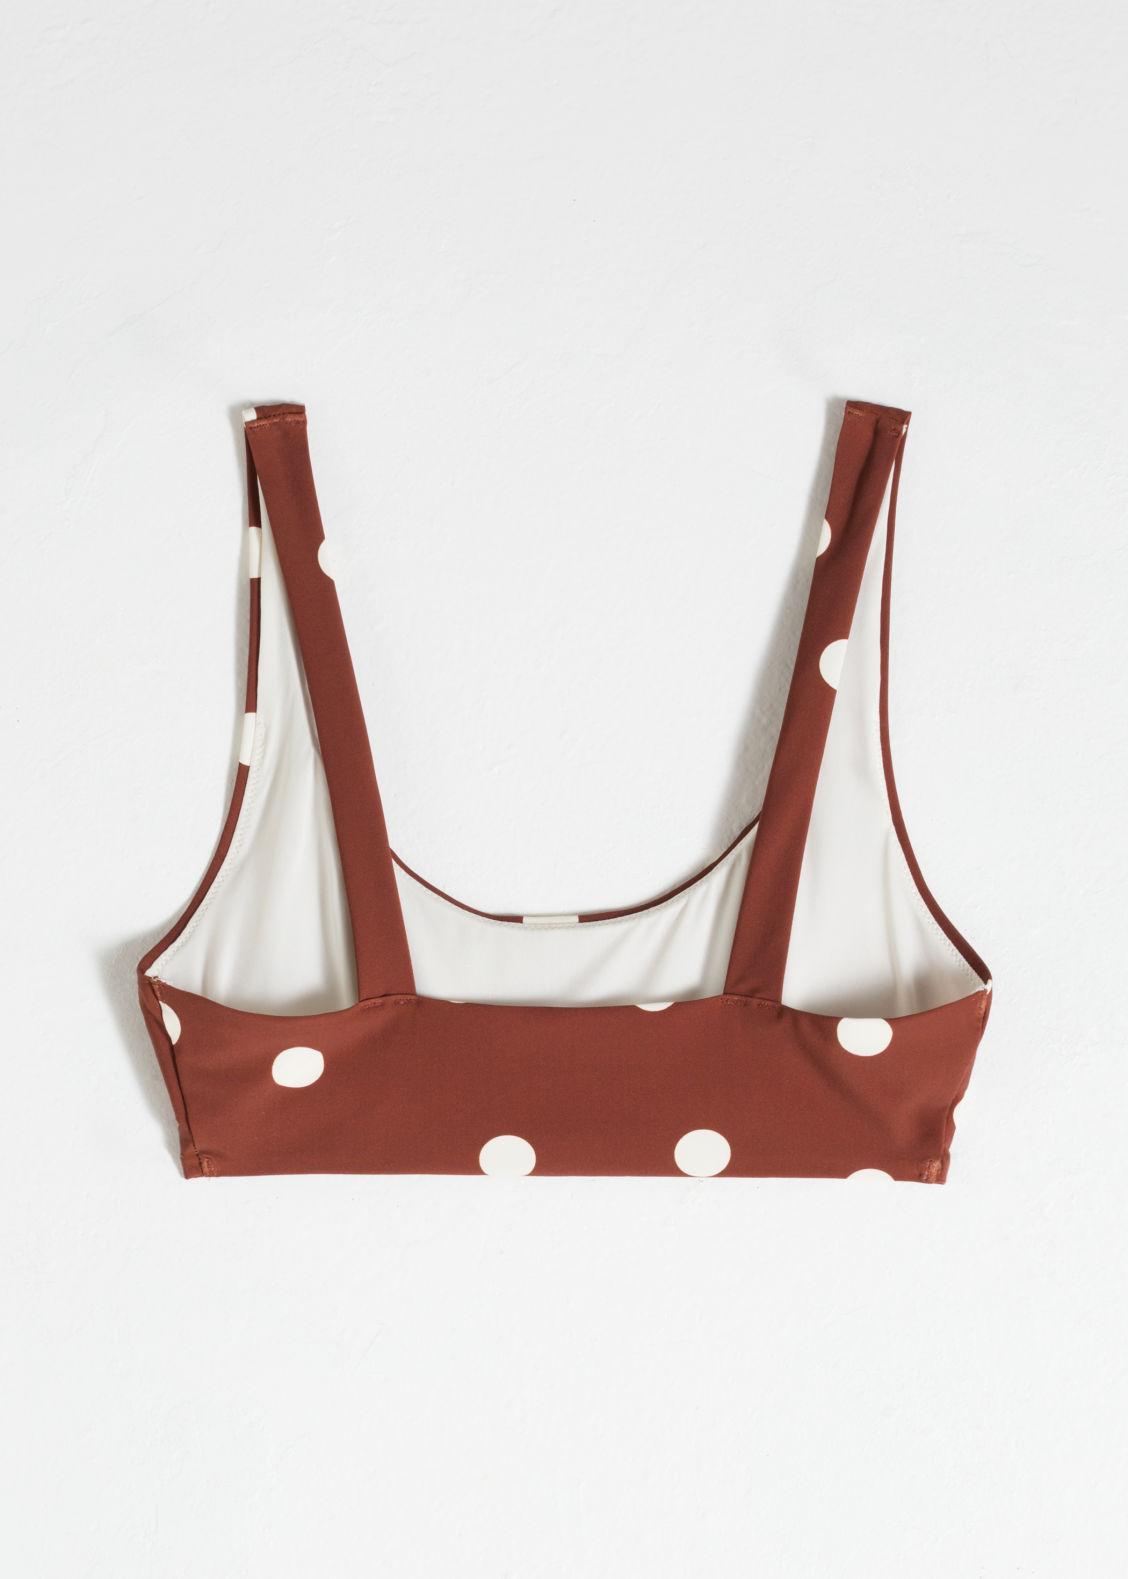 ef58576eceee Polka Dot Bikini Top - Brown - Tops - & Other Stories